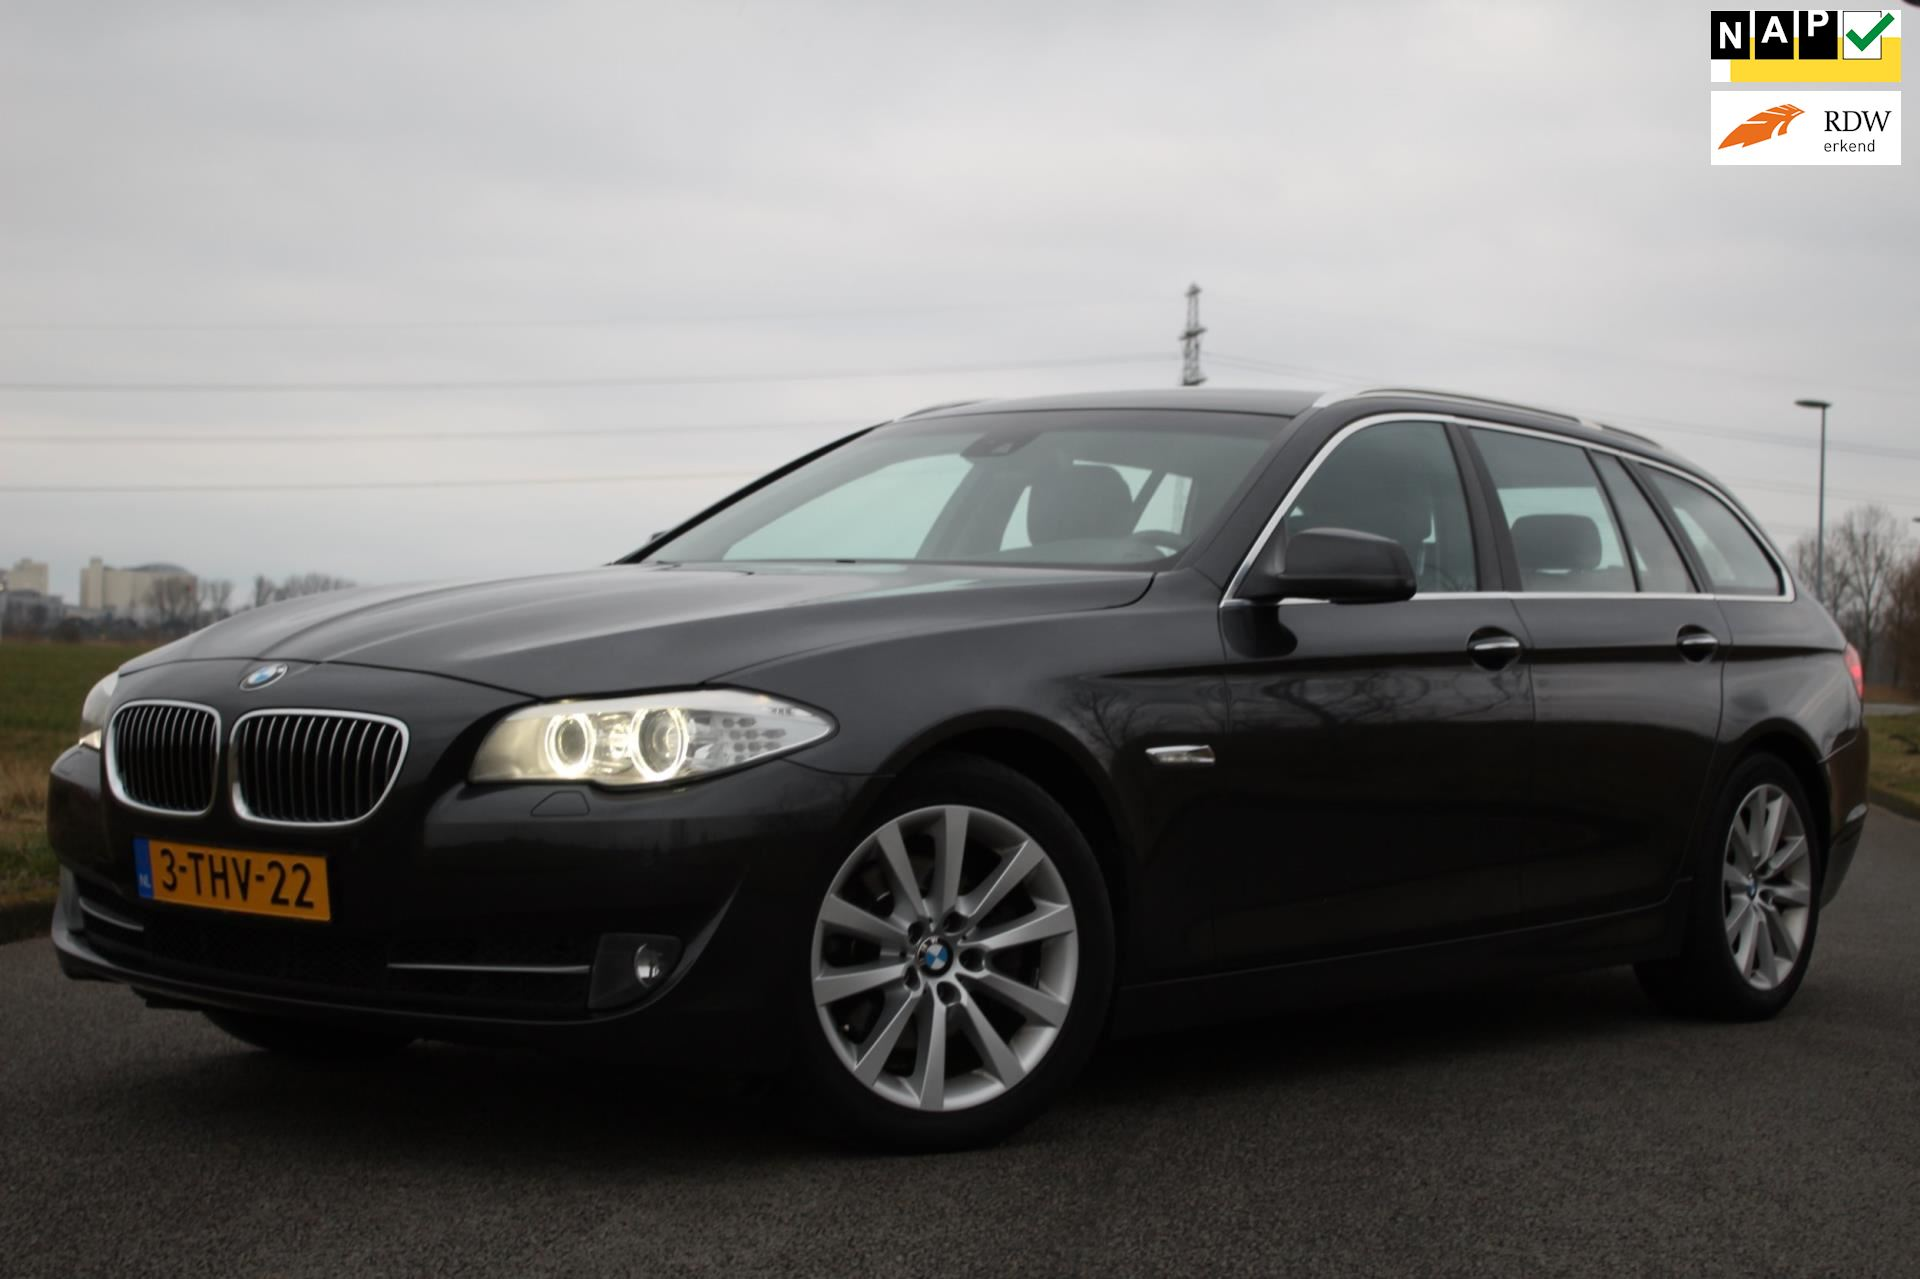 BMW 5-serie Touring occasion - Autobedrijf Simmeren & Veenstra